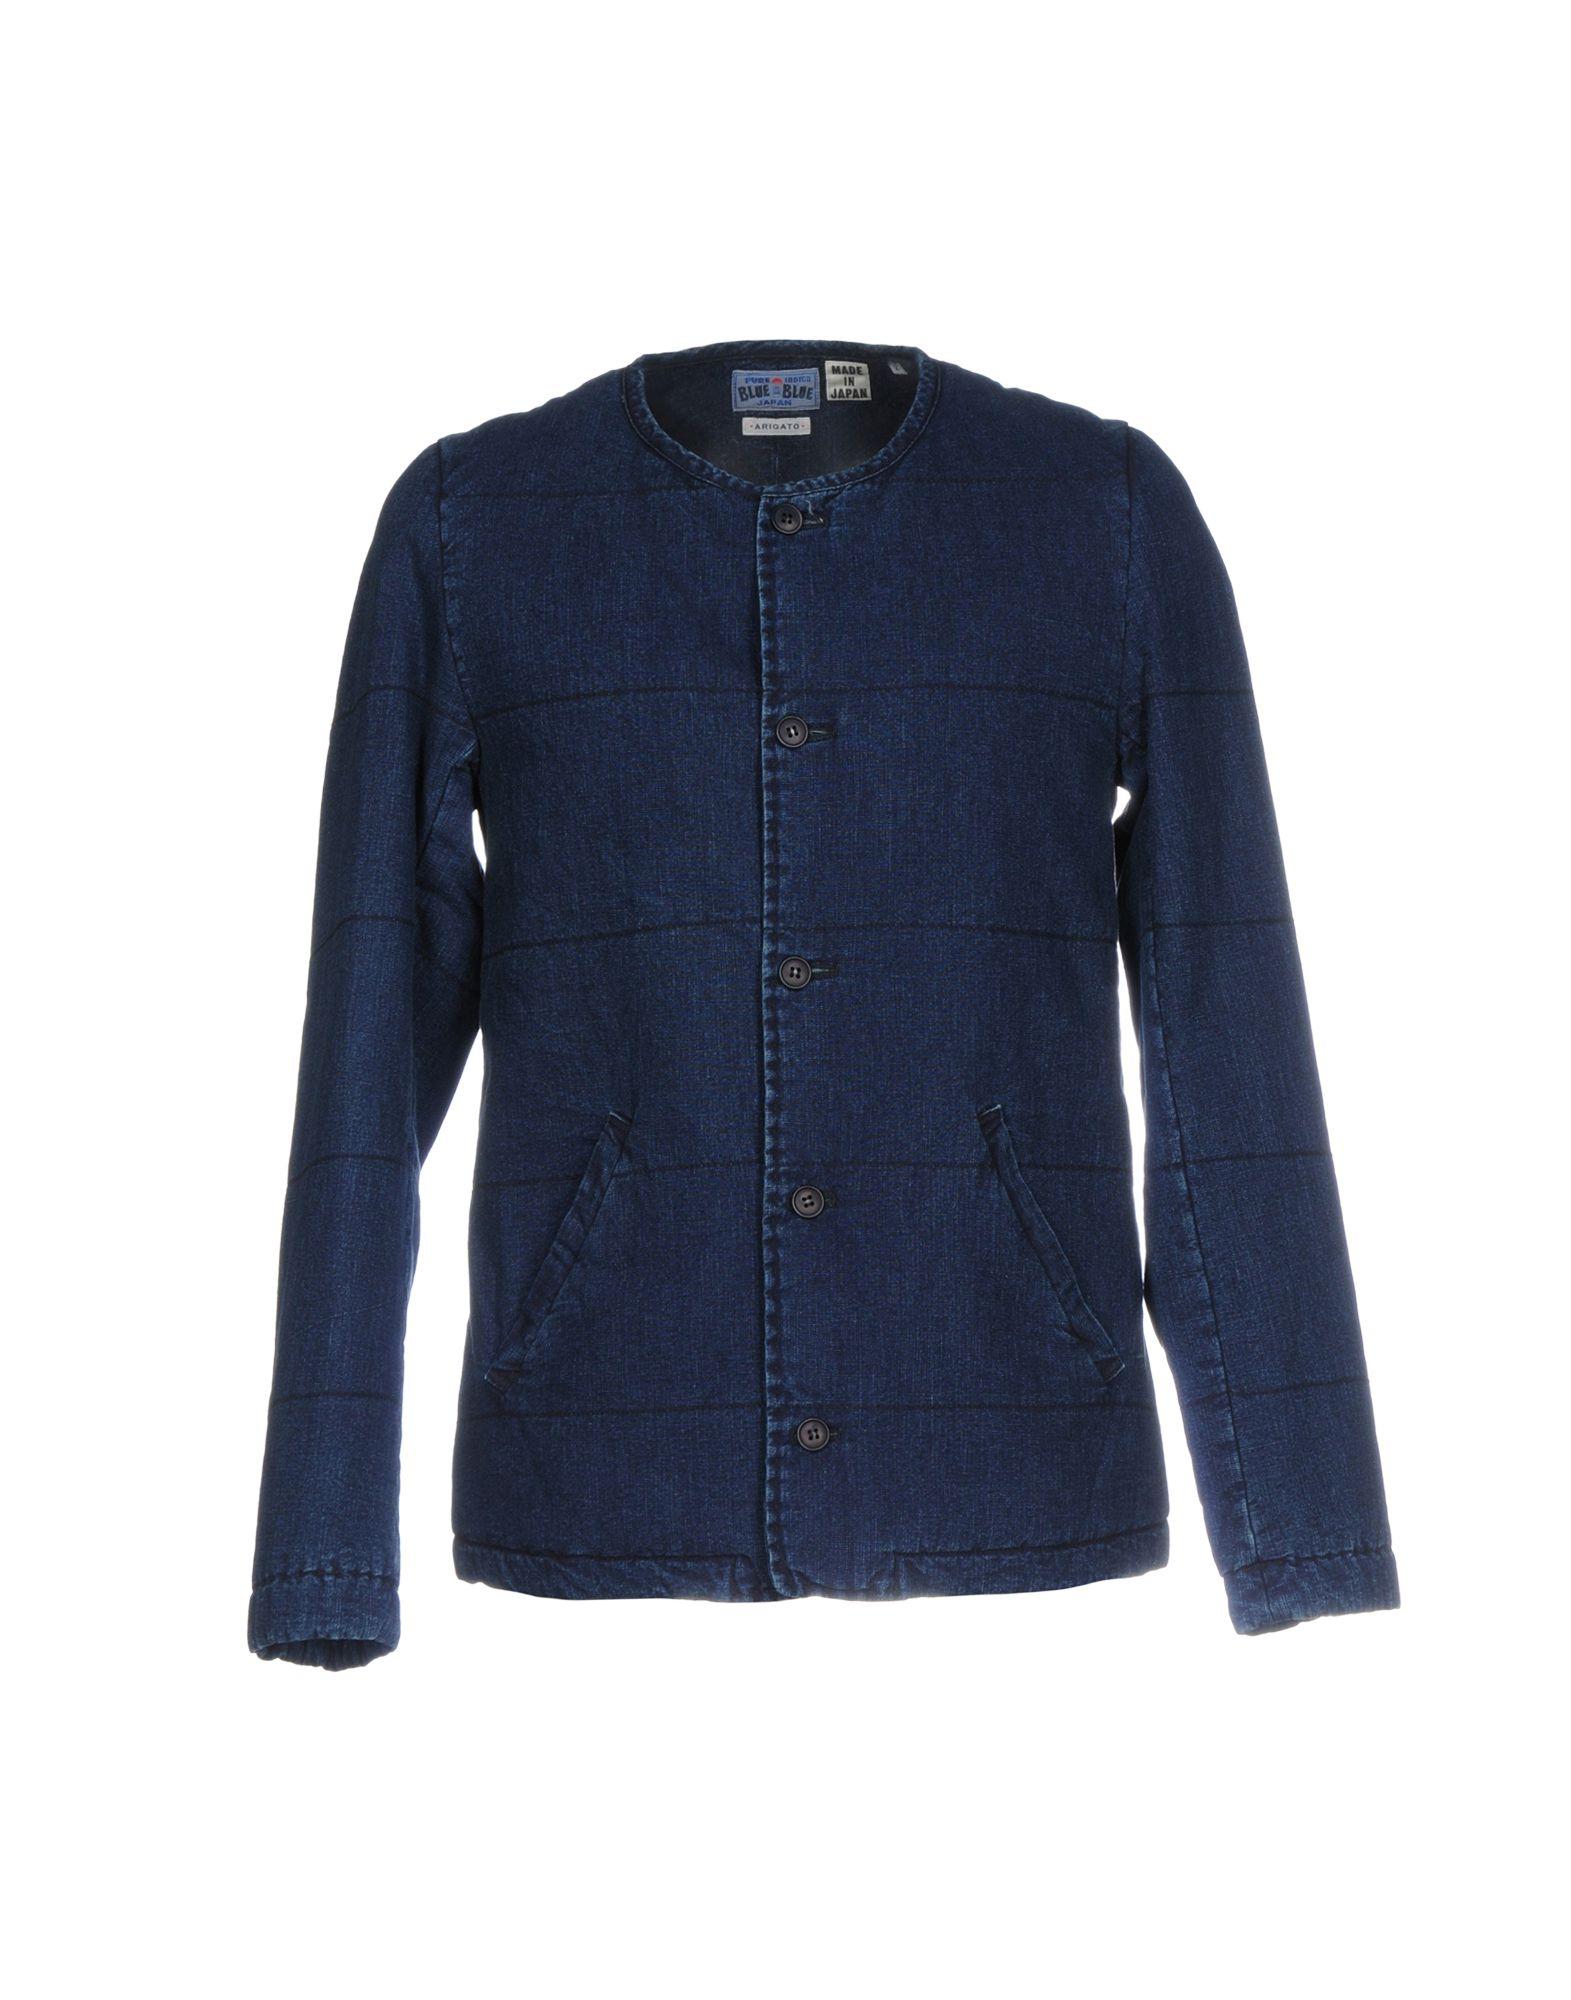 BLUE BLUE  JAPAN Джинсовая верхняя одежда верхняя одежда